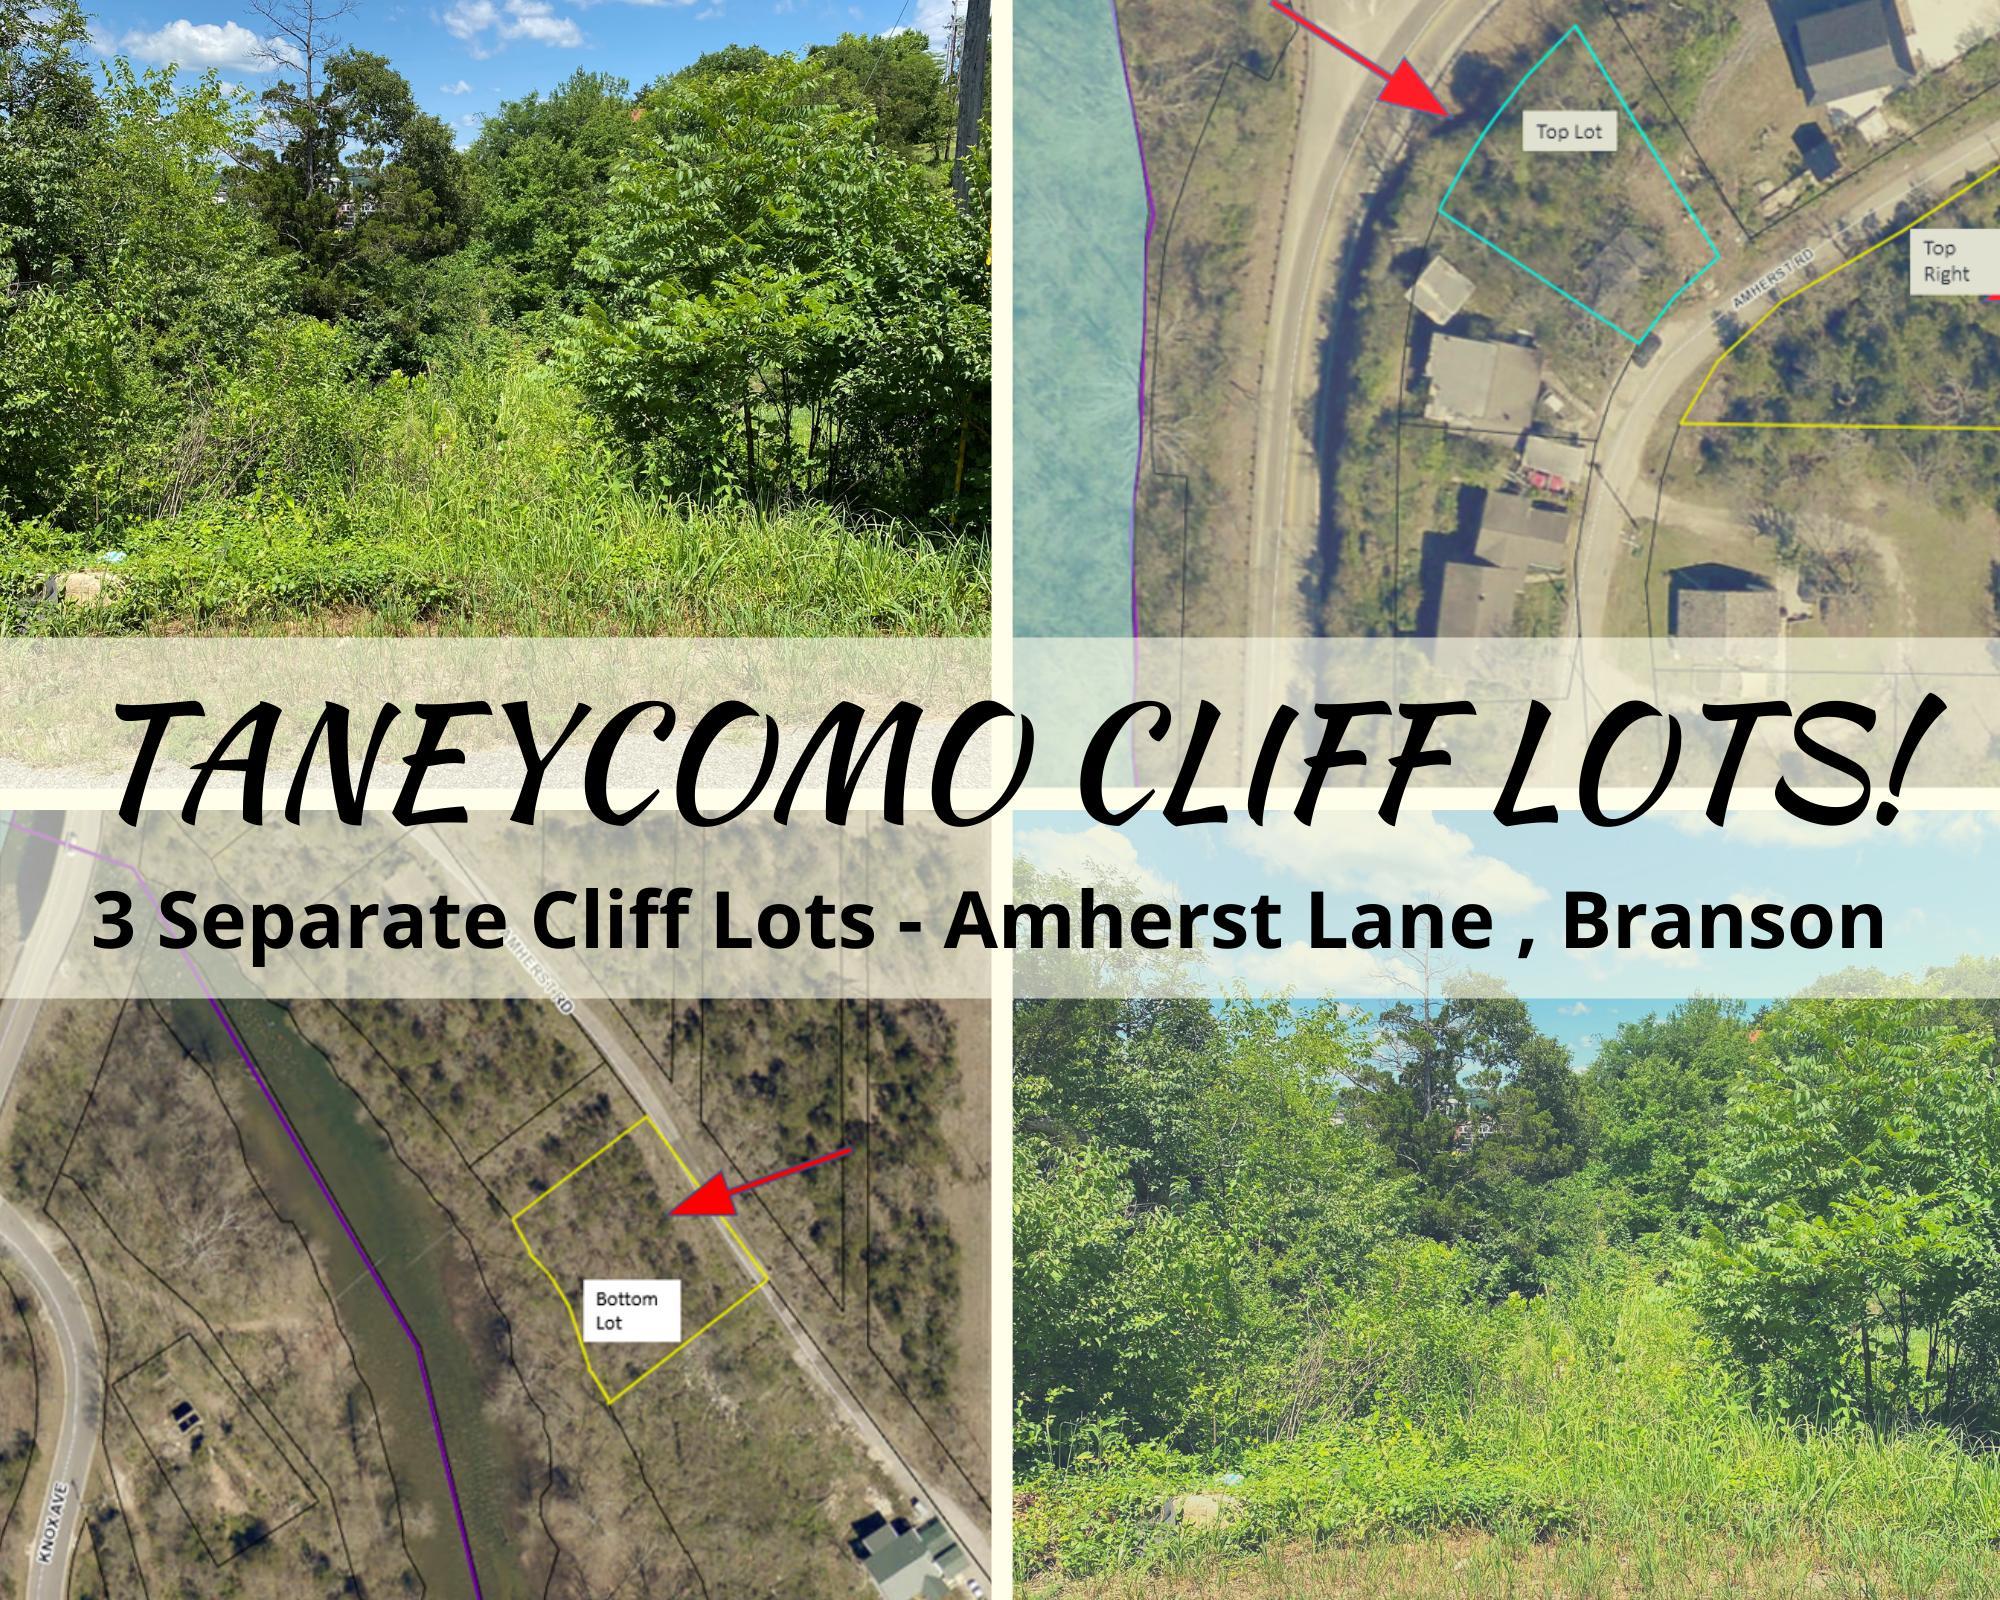 000 Longview Lots 13-19 Branson, MO 65616